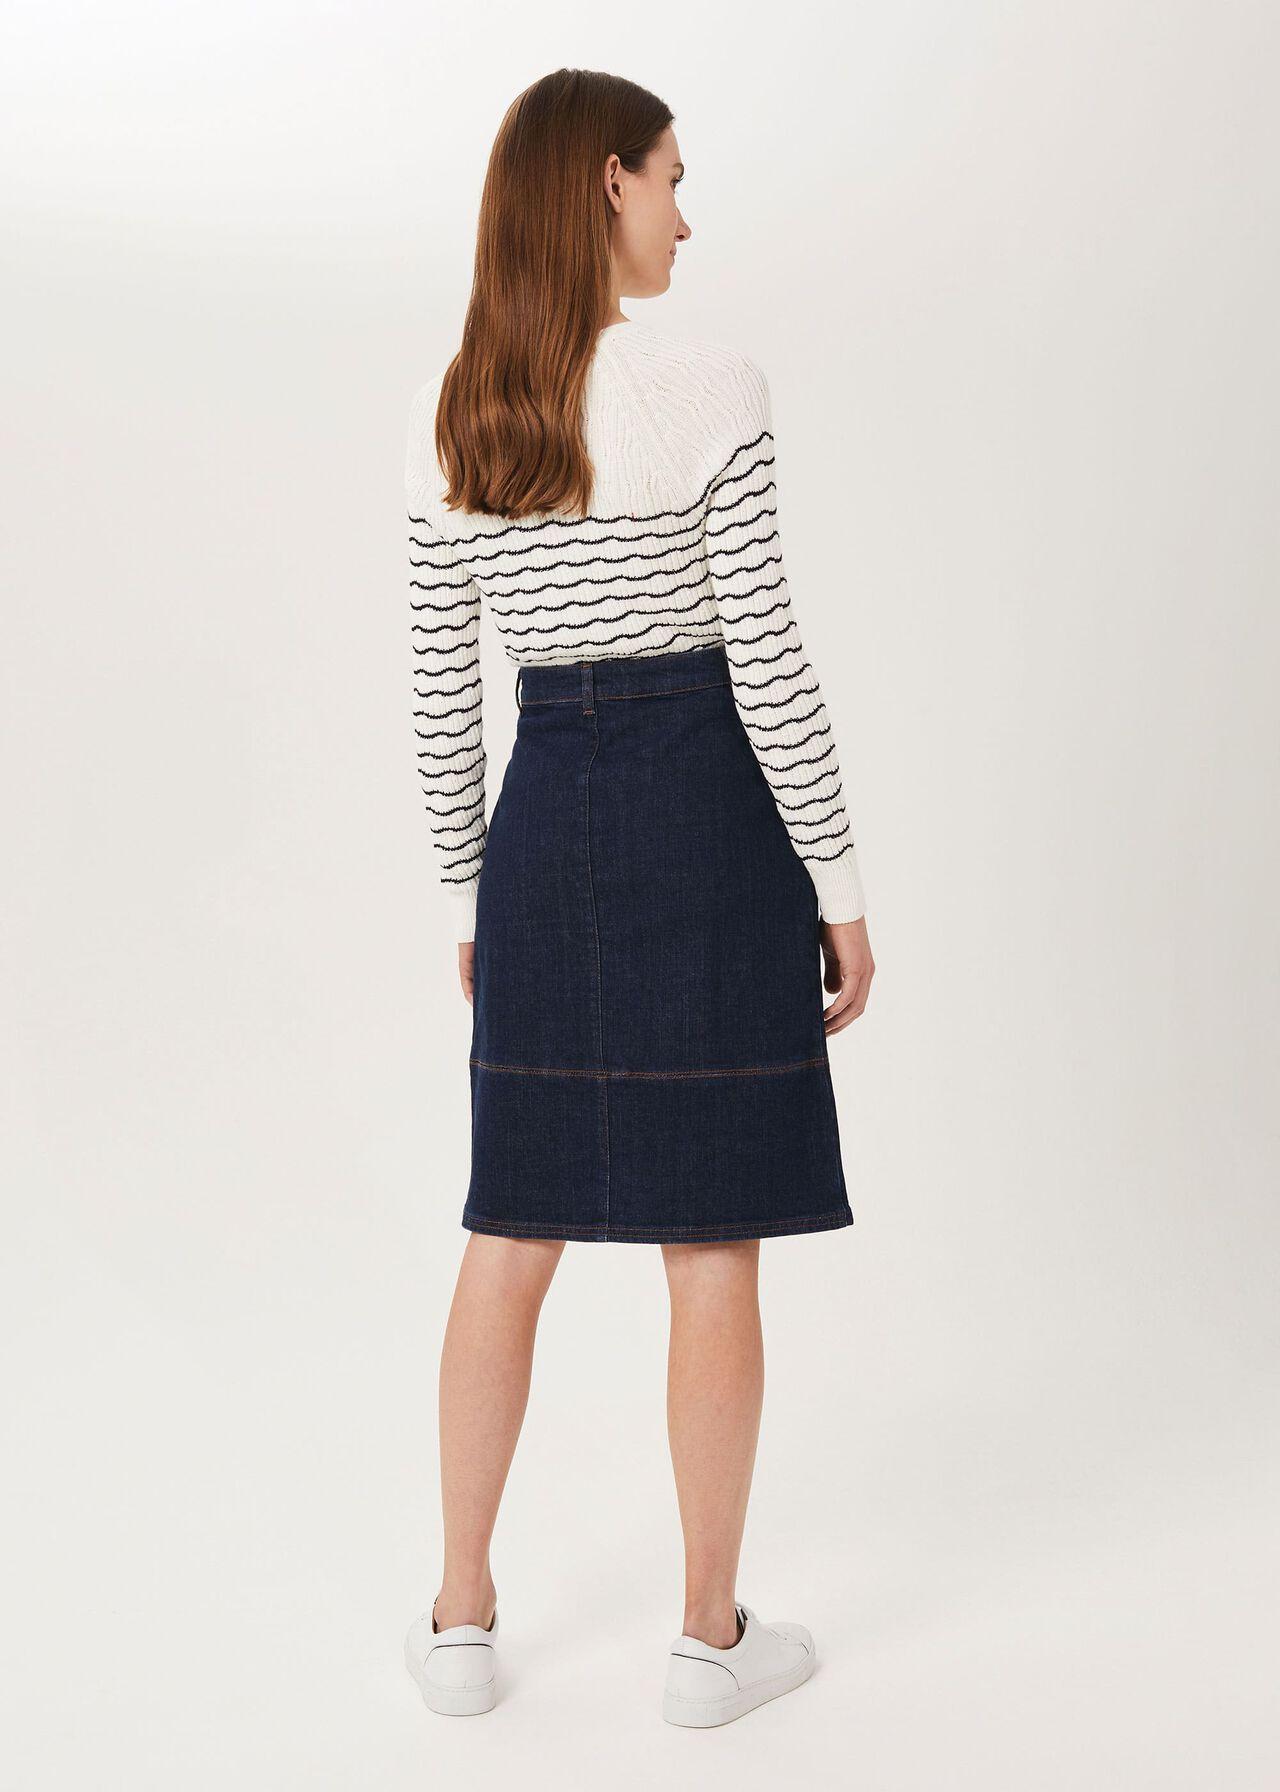 Macey Denim Skirt, Indigo, hi-res